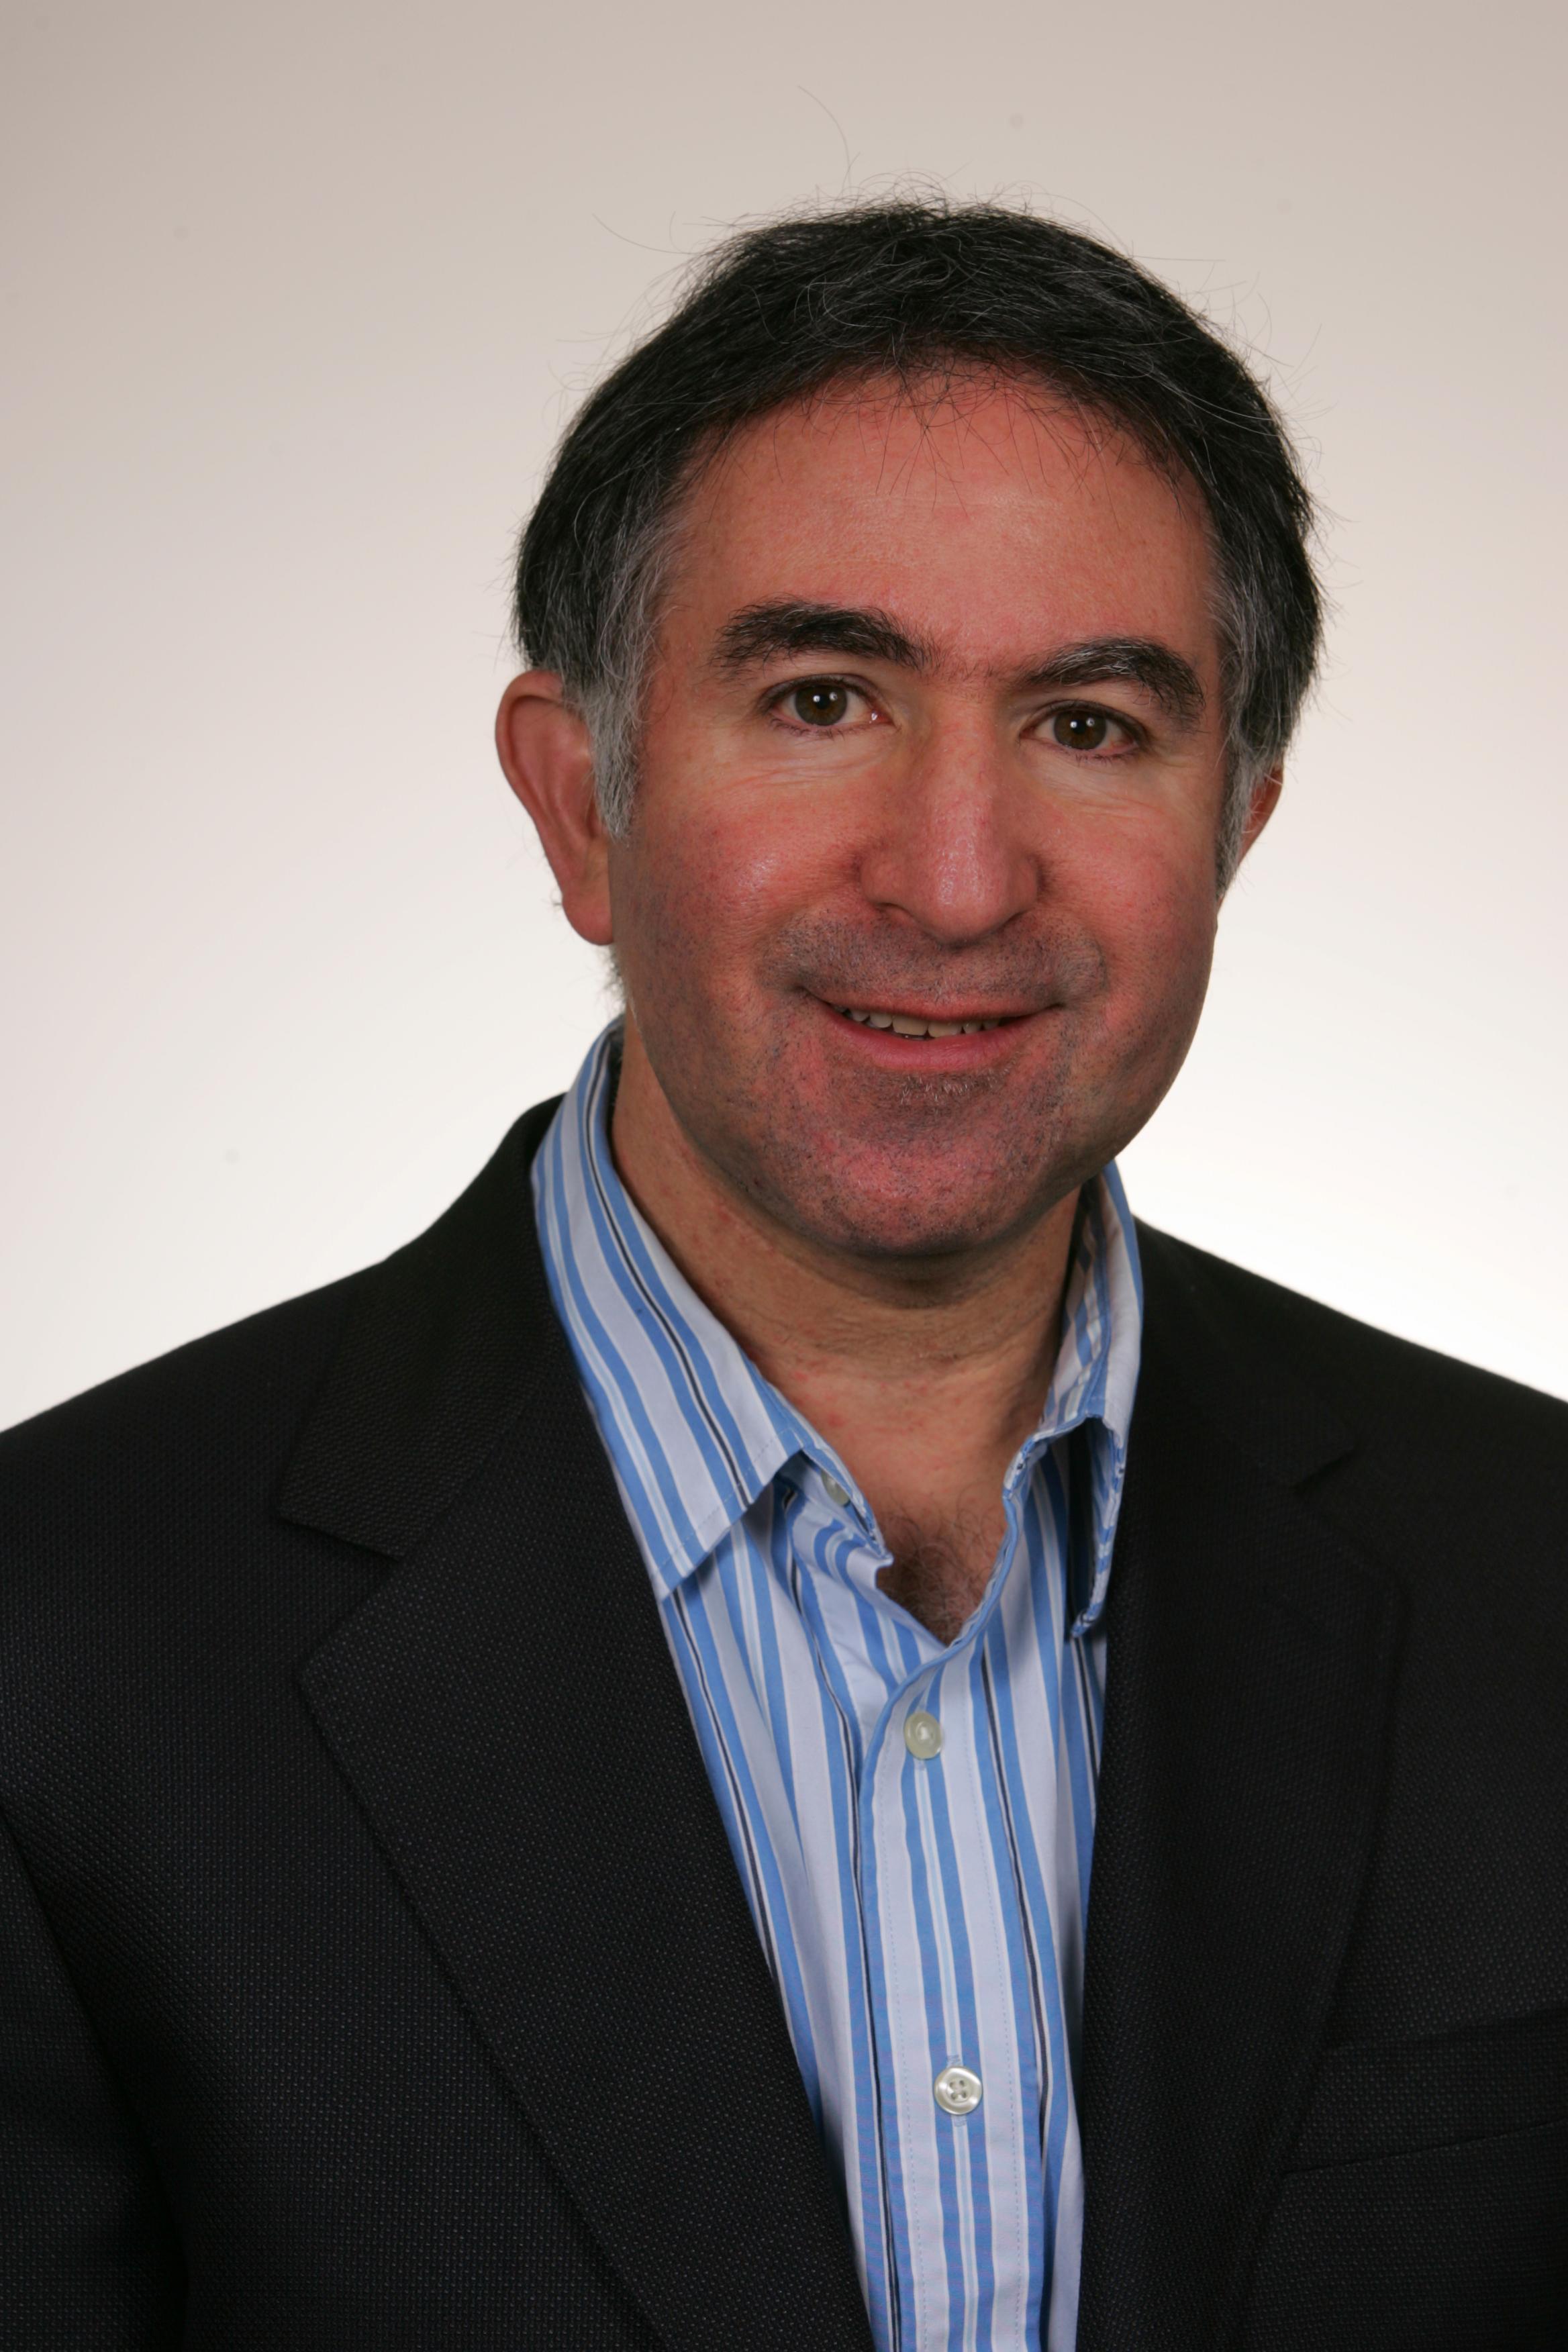 Glenn Encababian